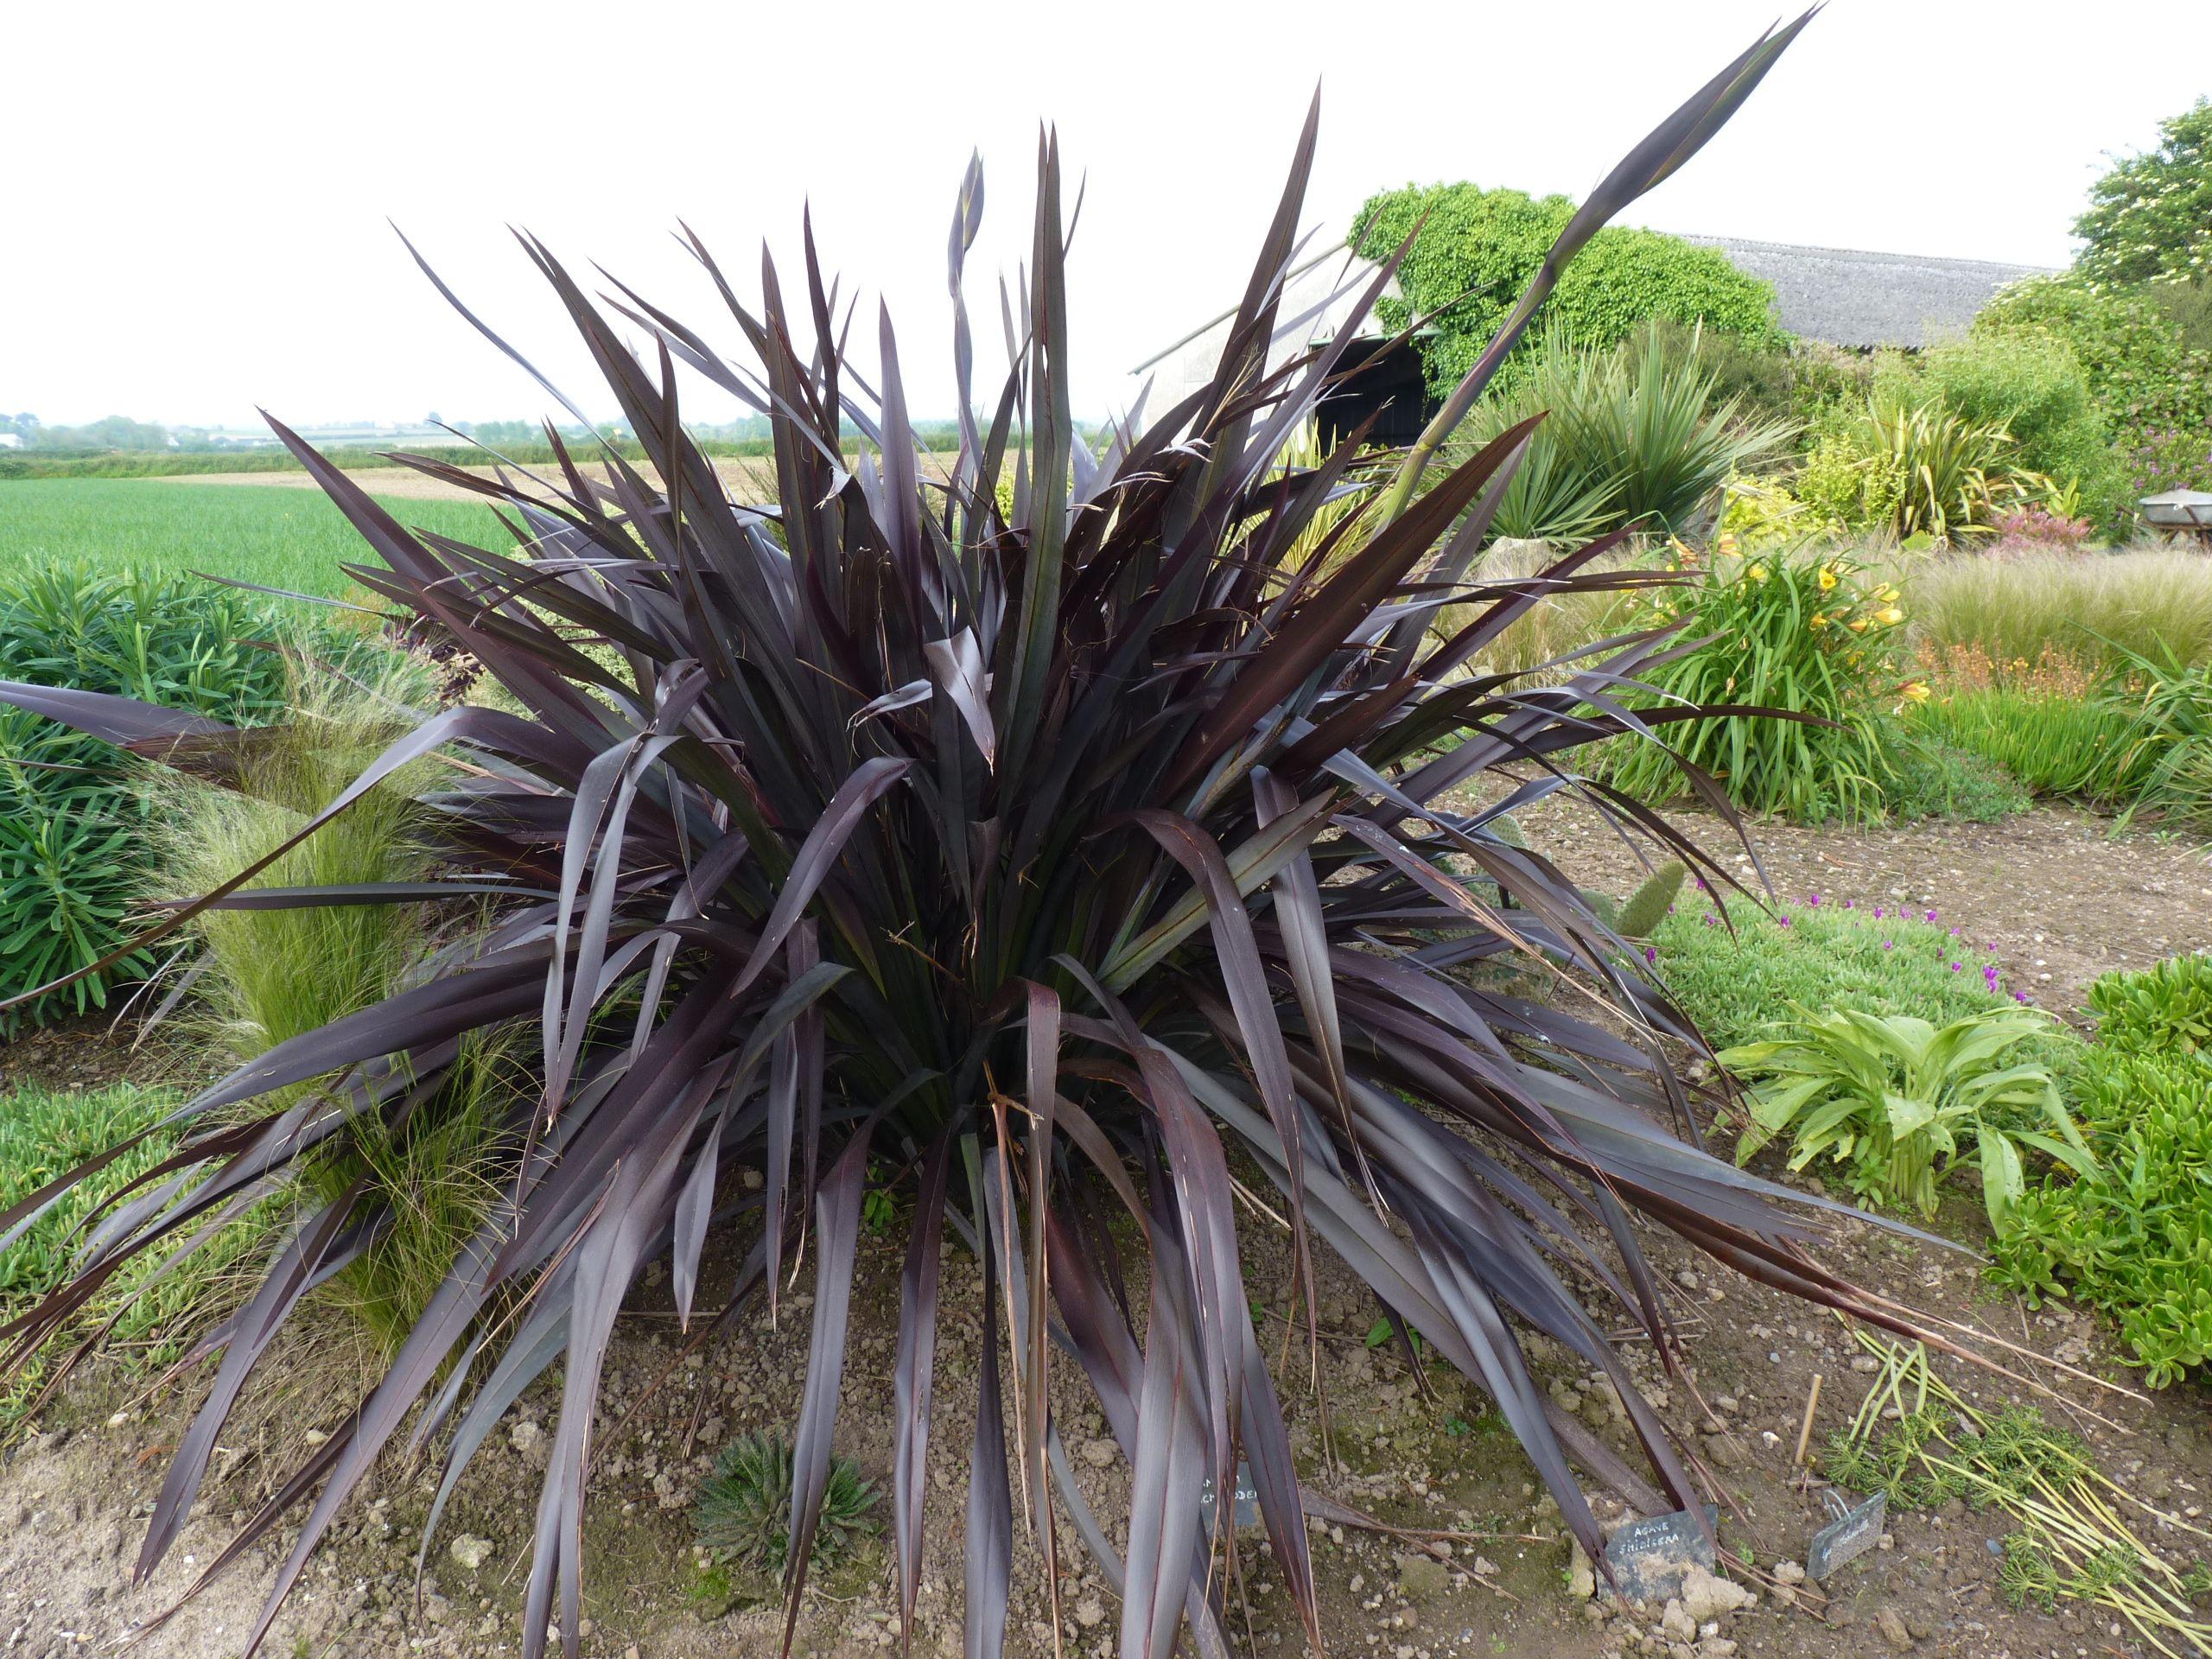 Platt S Black New Zealand Flax Phormium Platt S Black